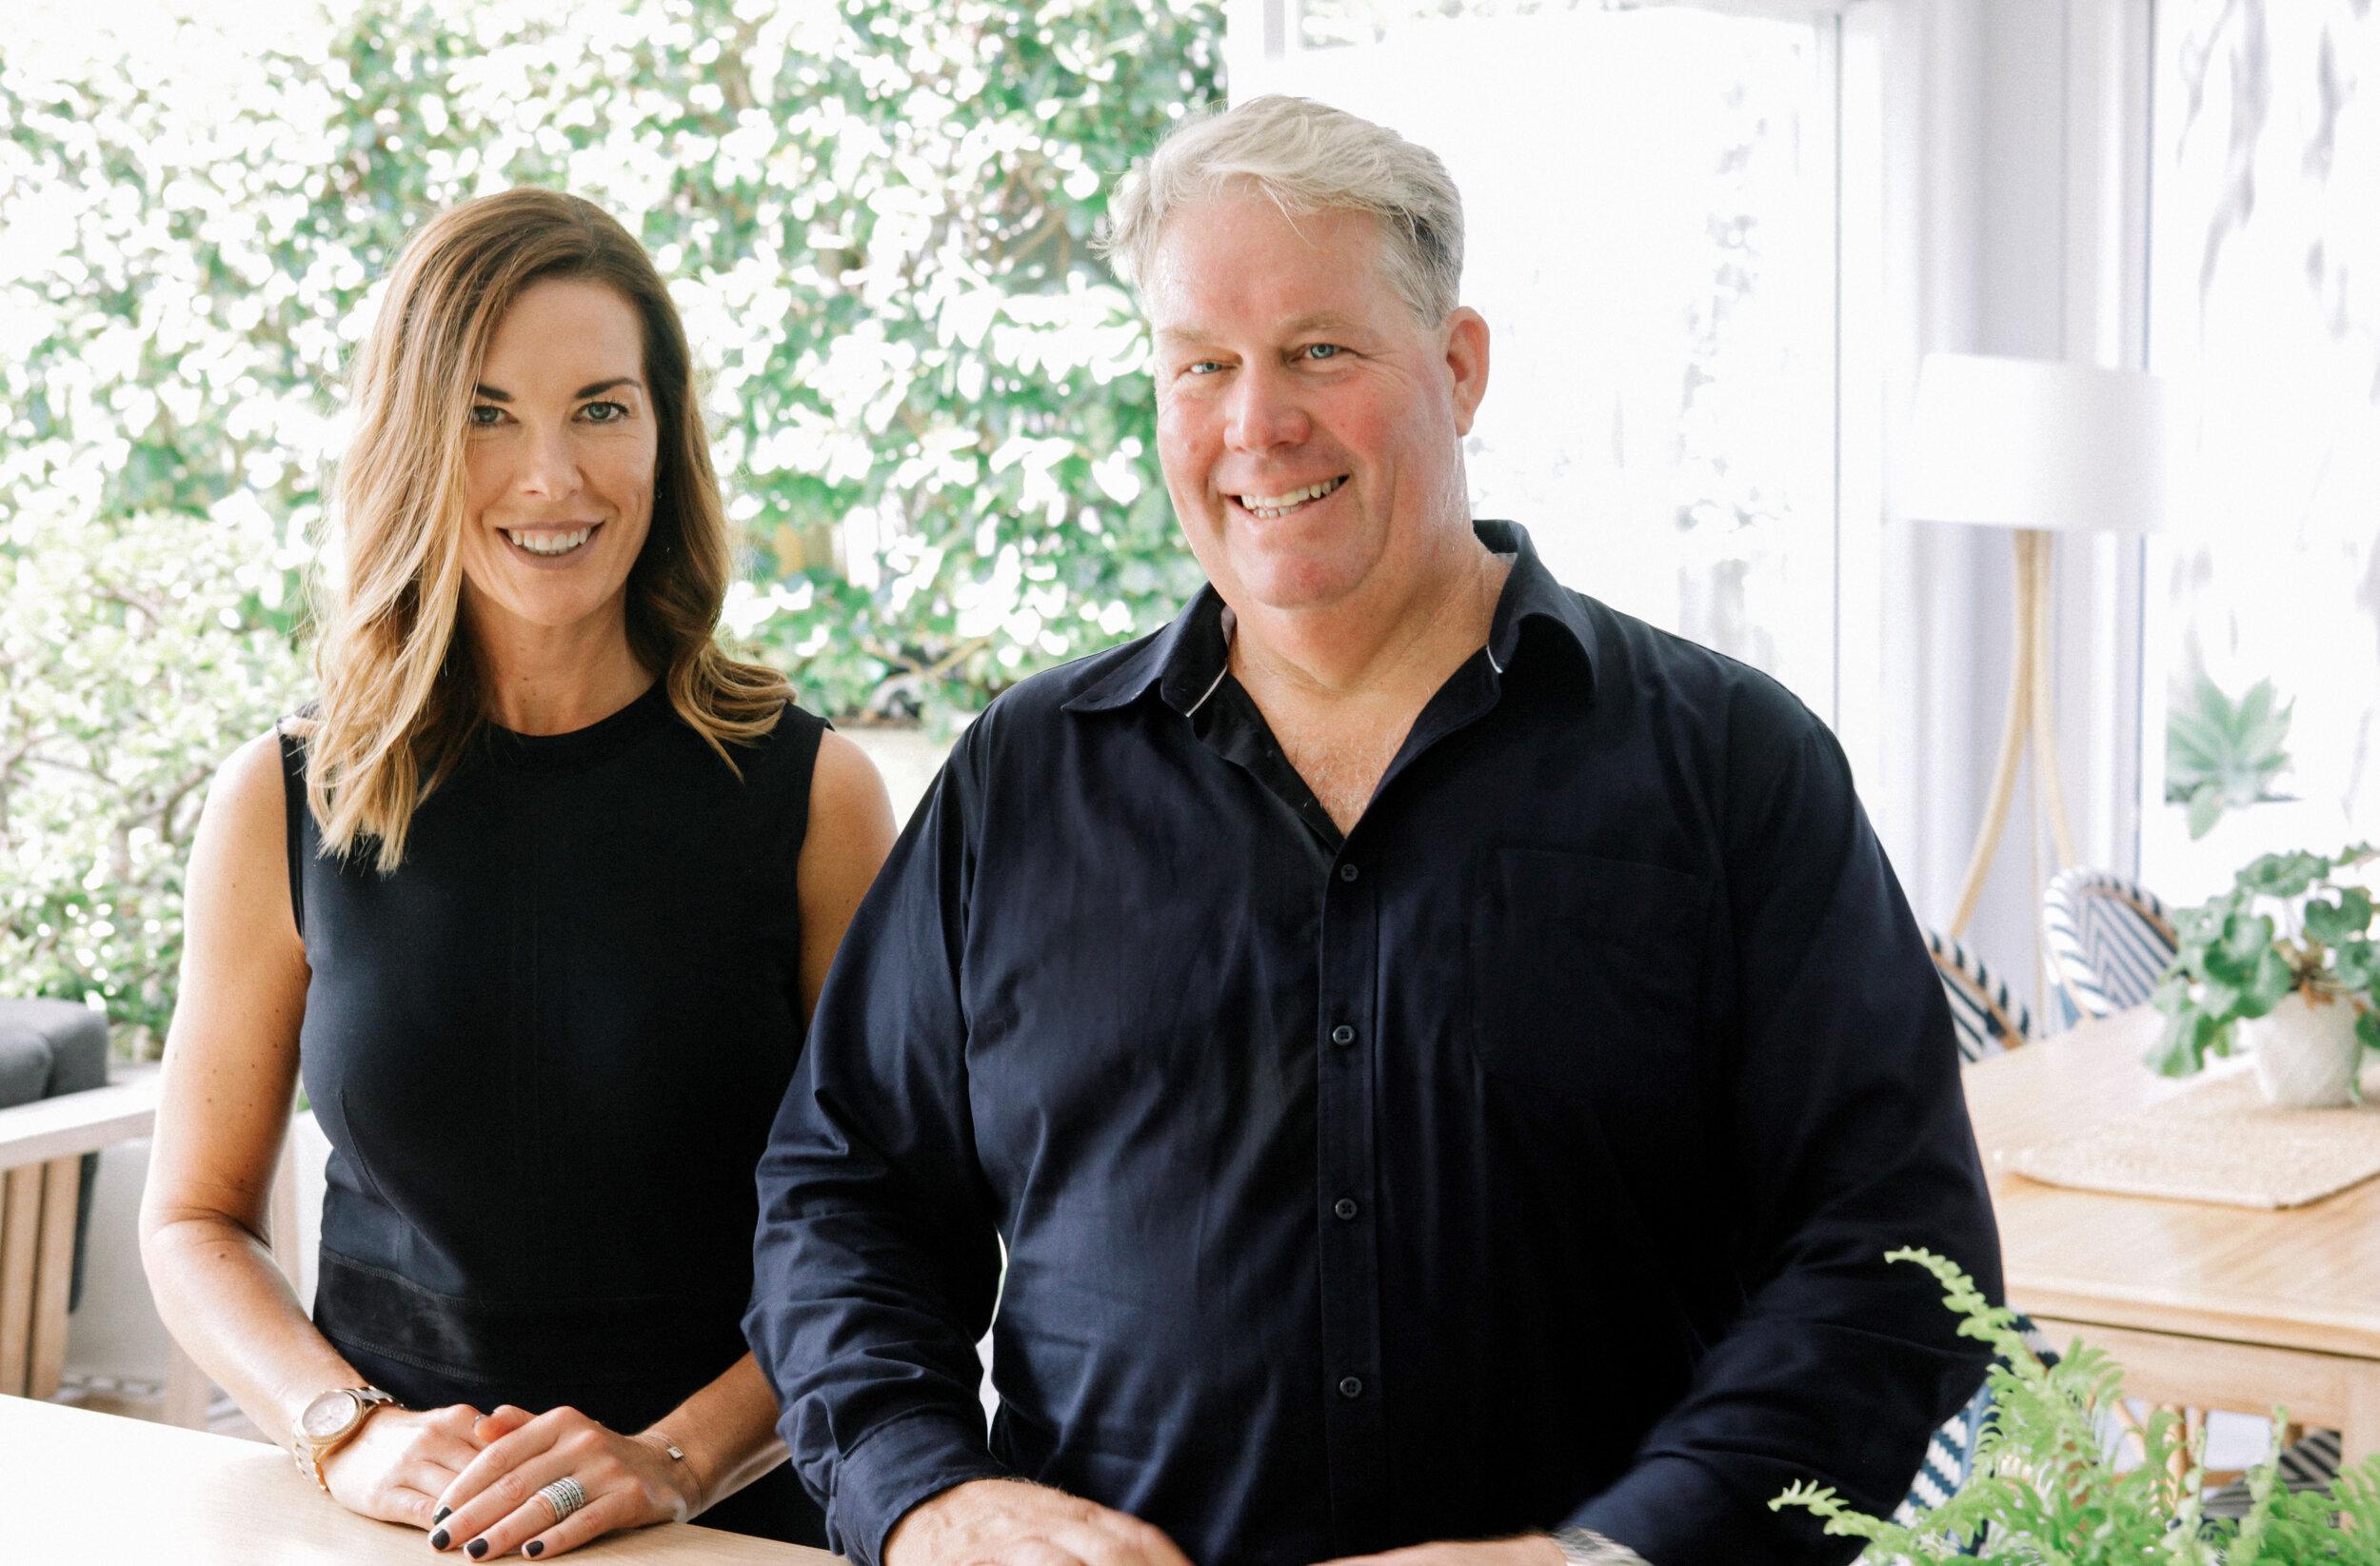 Mark and Kylie - Cropped (2019_05_14 04_52_39 UTC).jpg